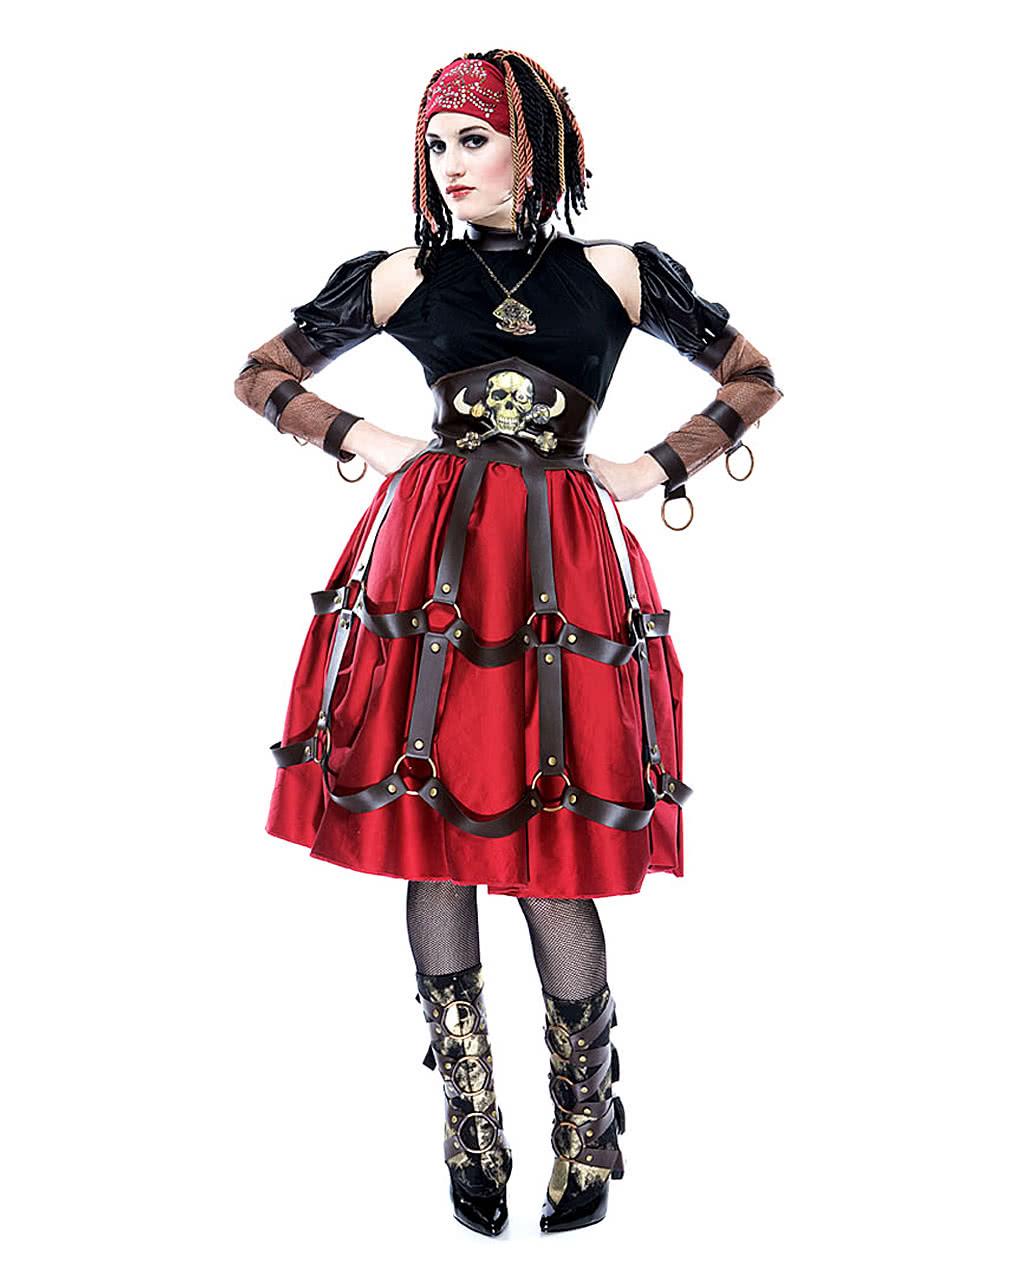 steampunk piraten maid kost m m f r halloween horror. Black Bedroom Furniture Sets. Home Design Ideas